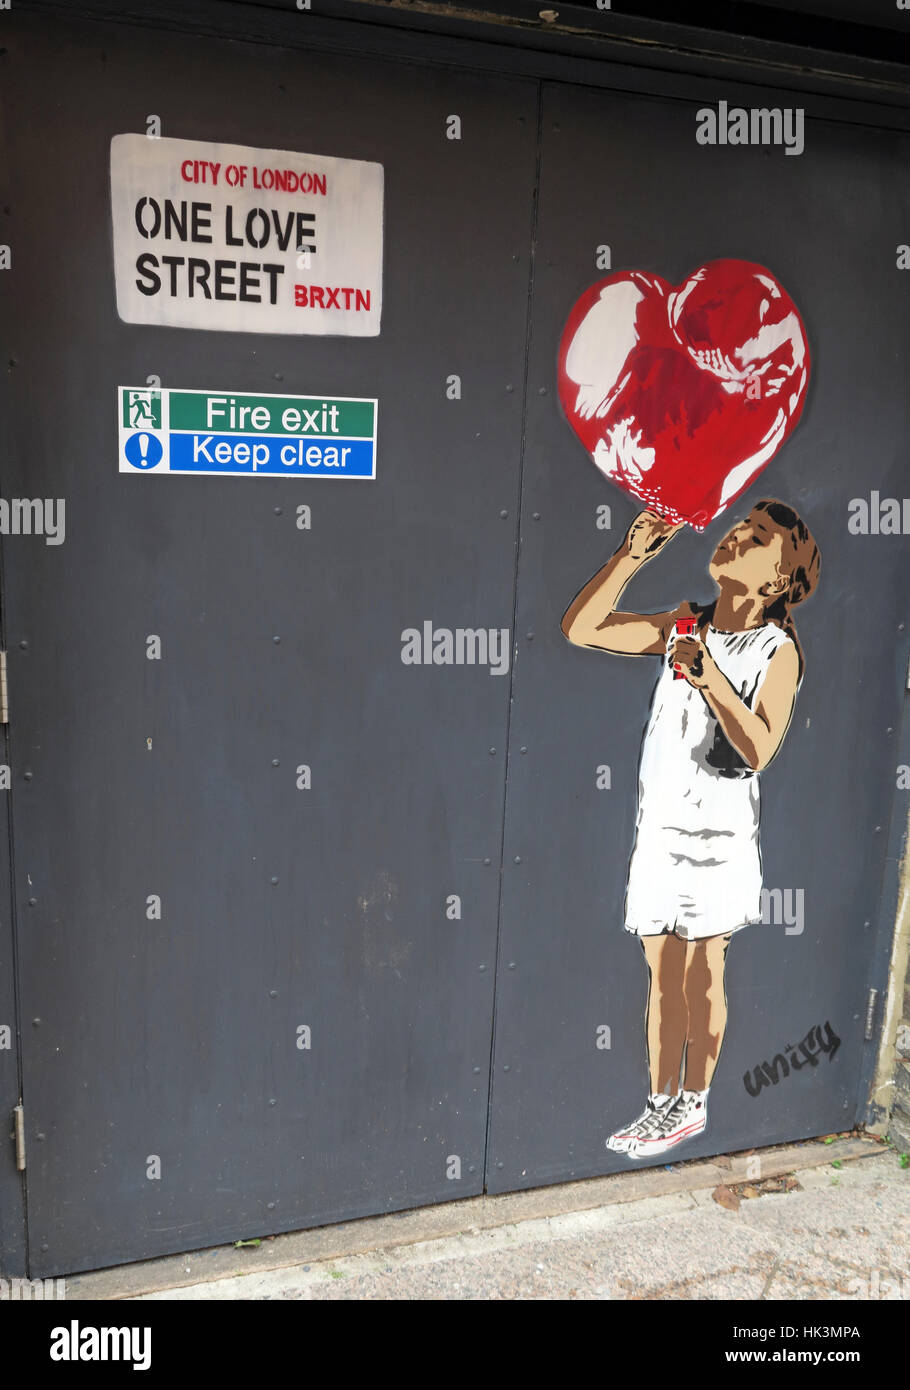 Street art in Brixton London, England, UK - One Love street girl with balloon - Stock Image